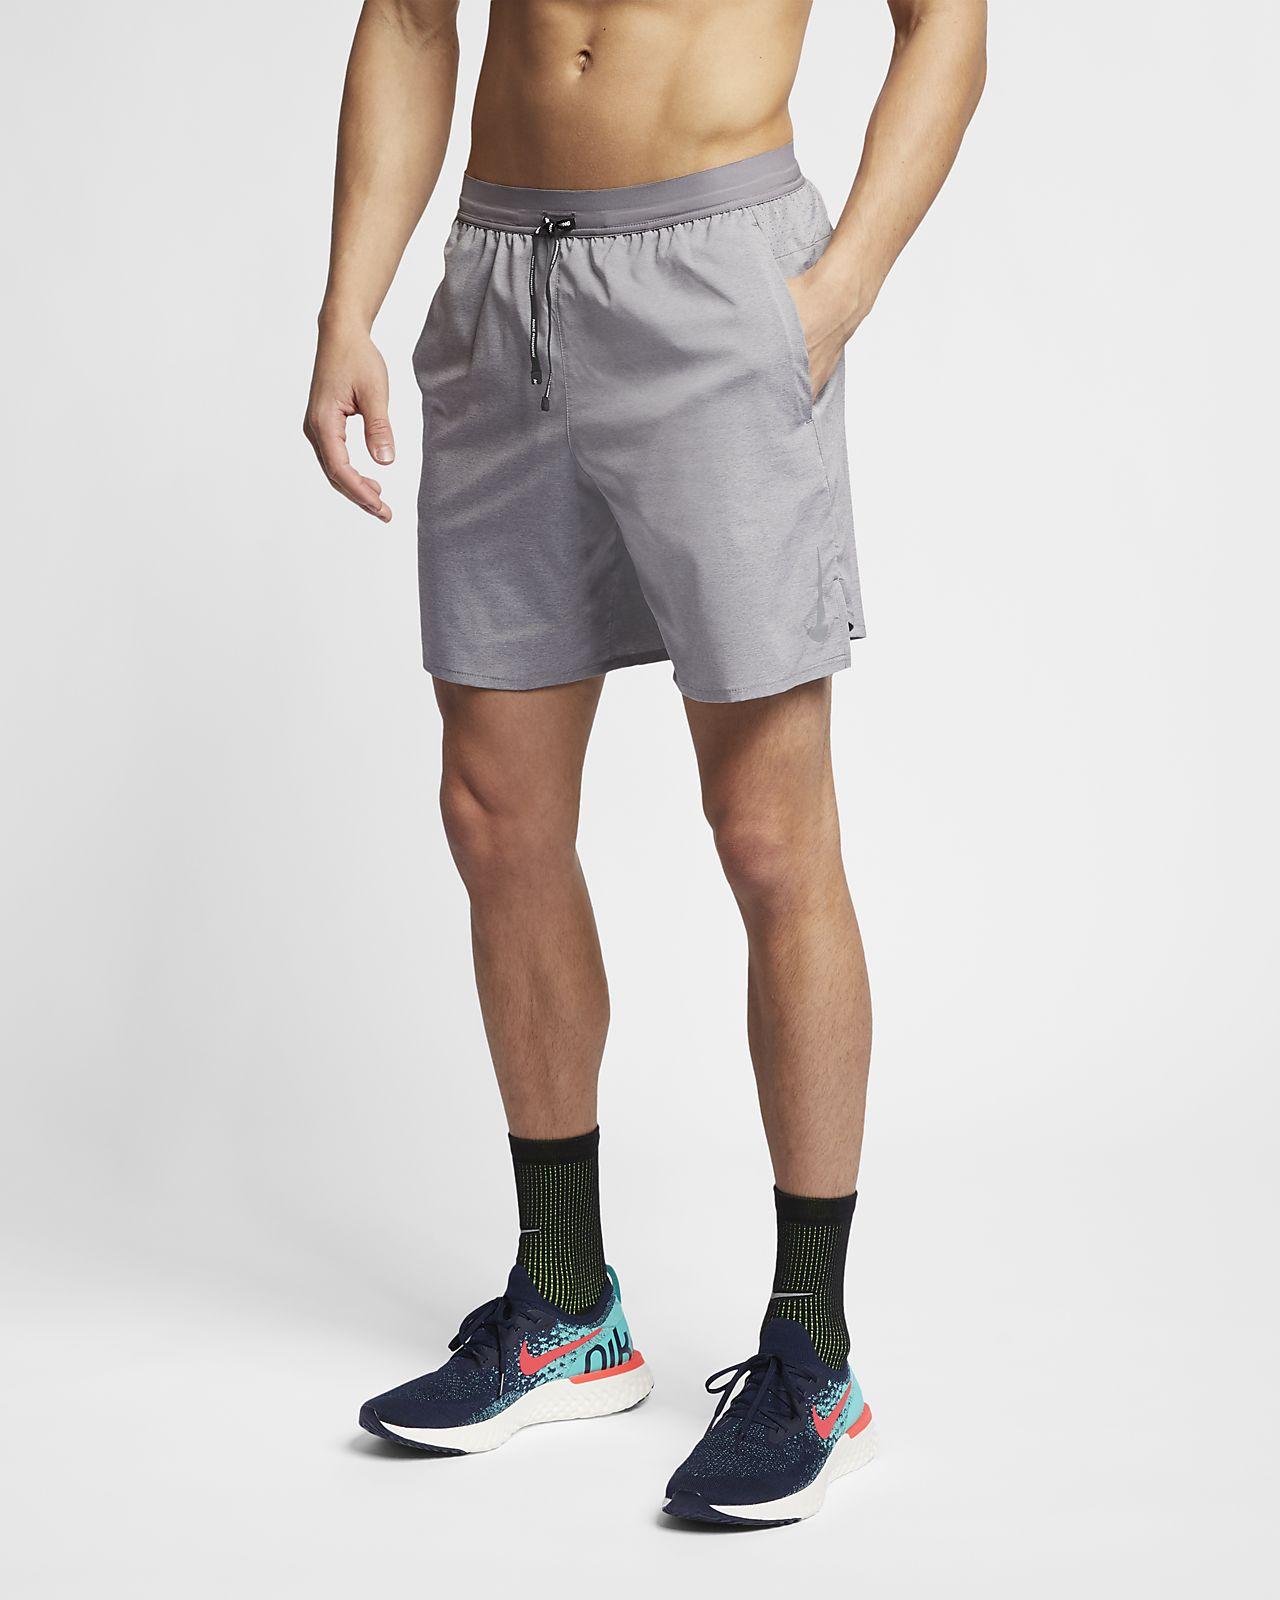 Nike Dri FIT Flex Stride 2 in 1 hardloopshorts voor heren (18 cm)